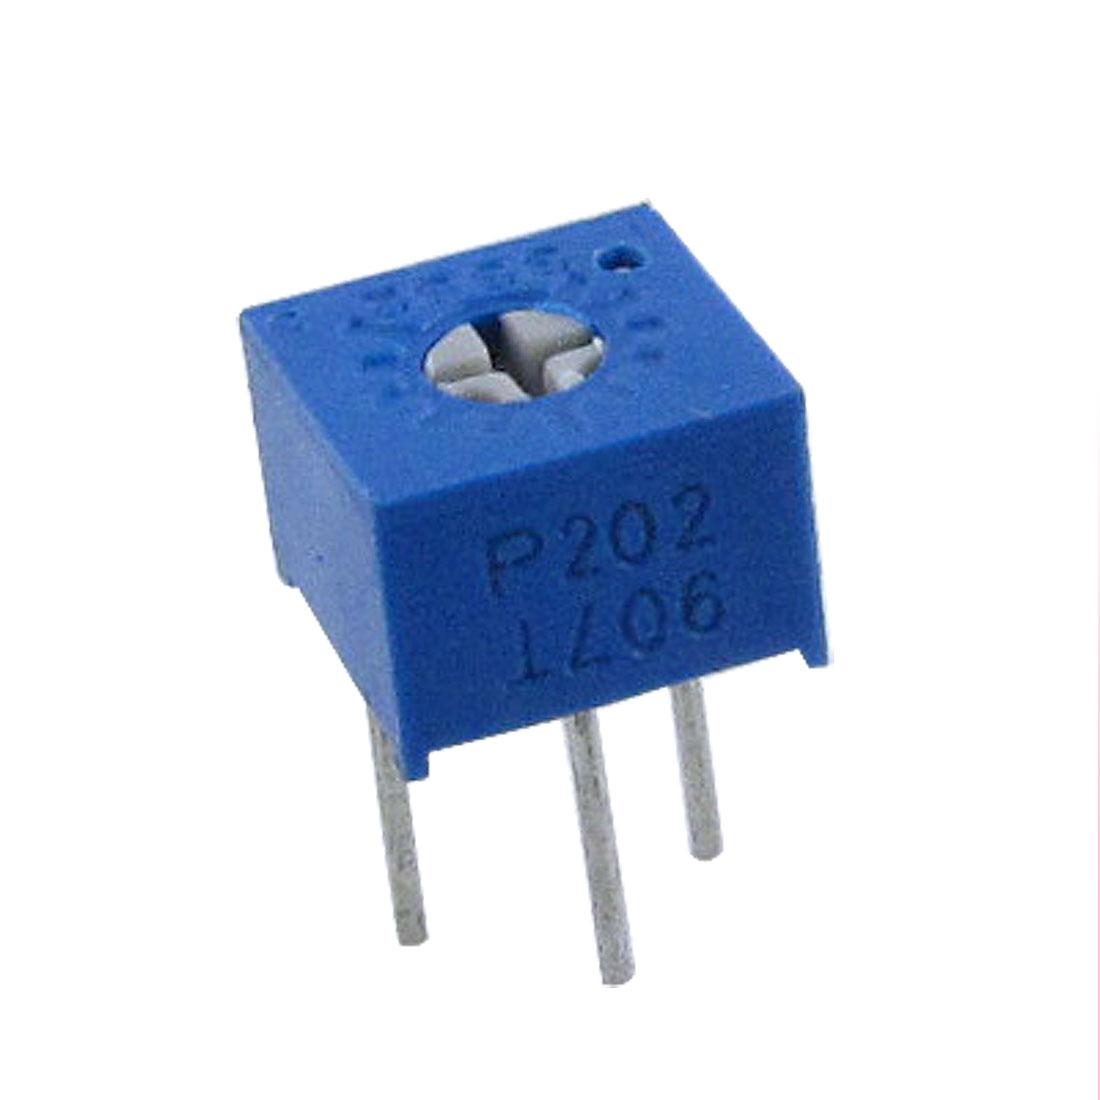 50 Pcs 3362P 2K Ohm Trim Pot Potentiometers Variable Resistors